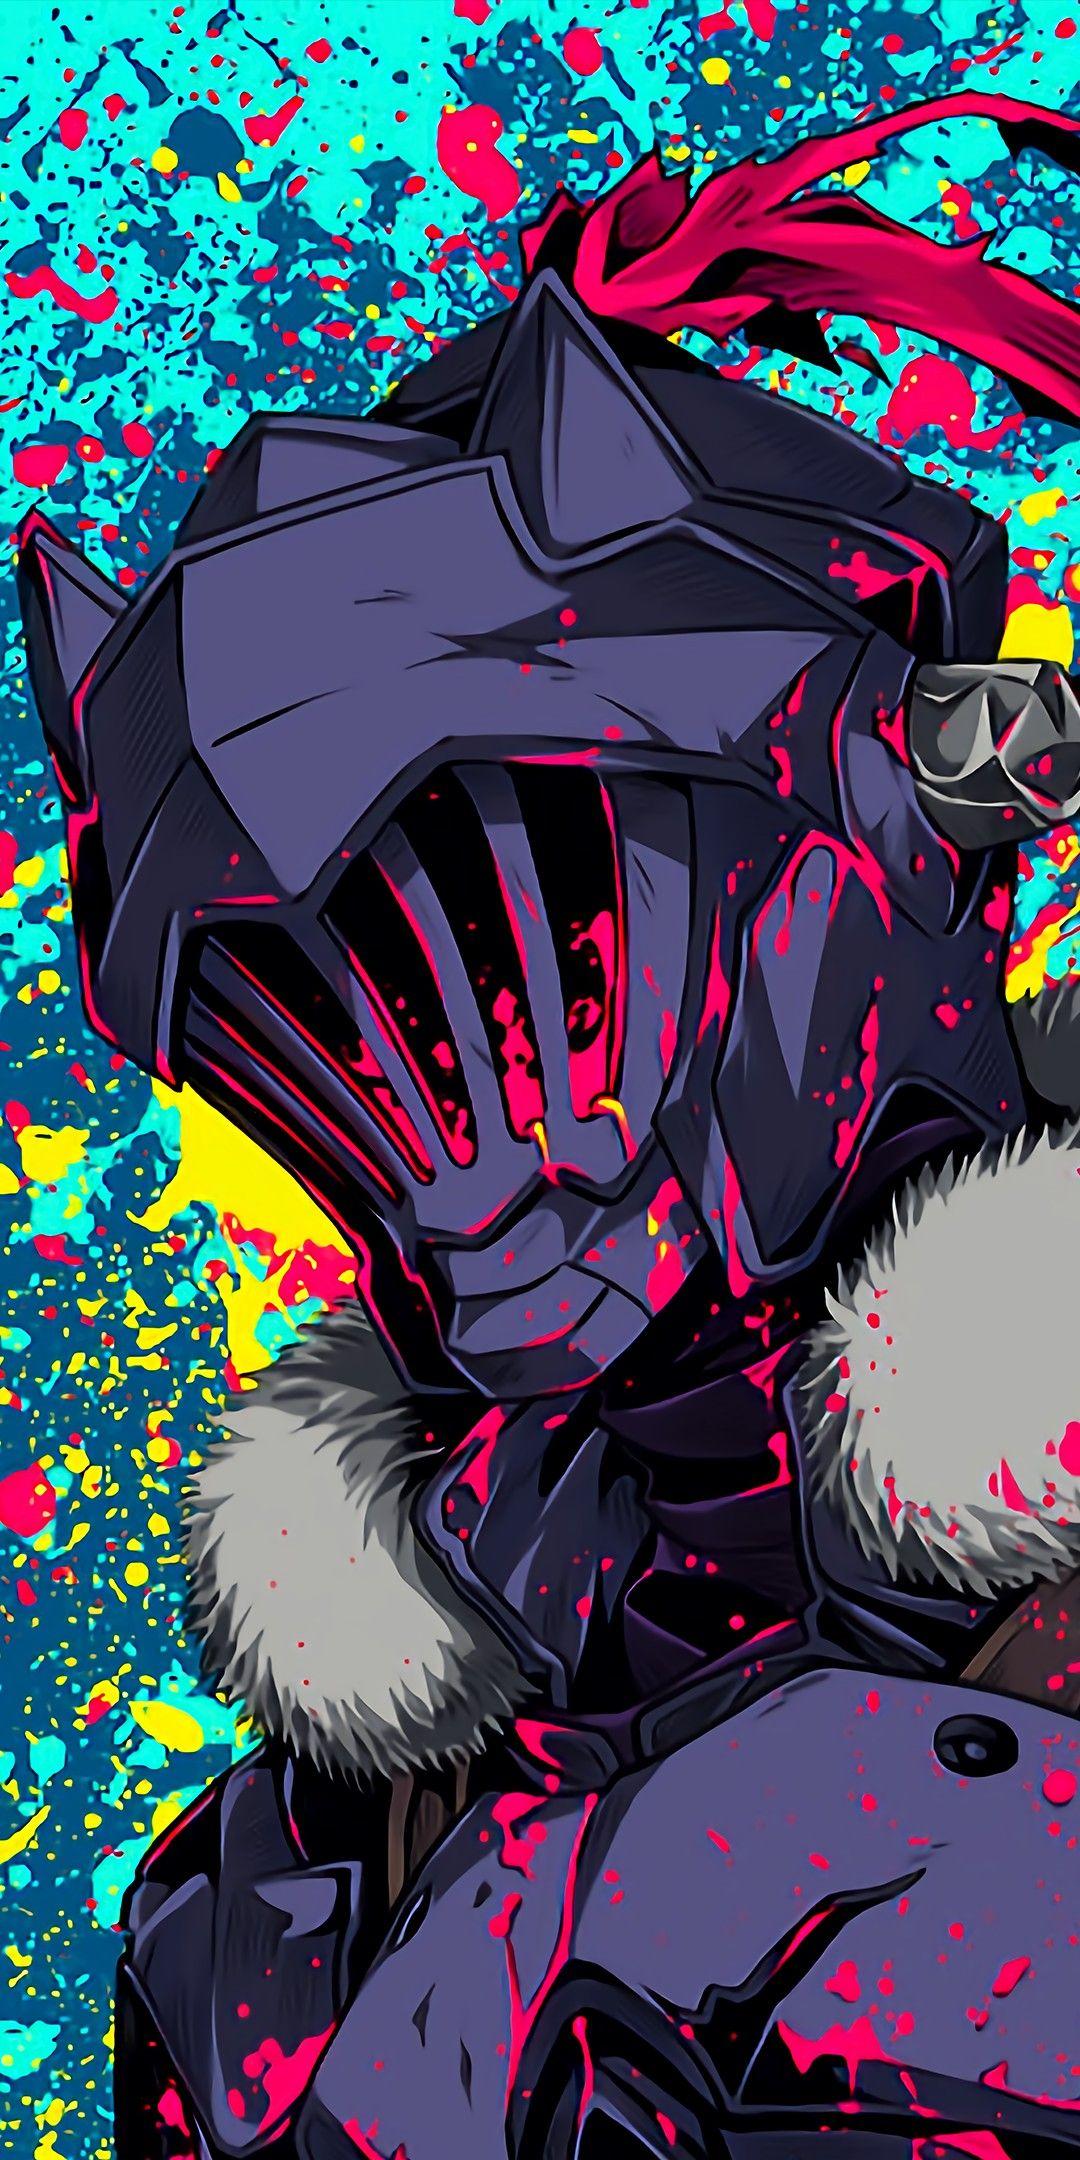 Pin de Animelife em Goblin Slayer Animes wallpapers